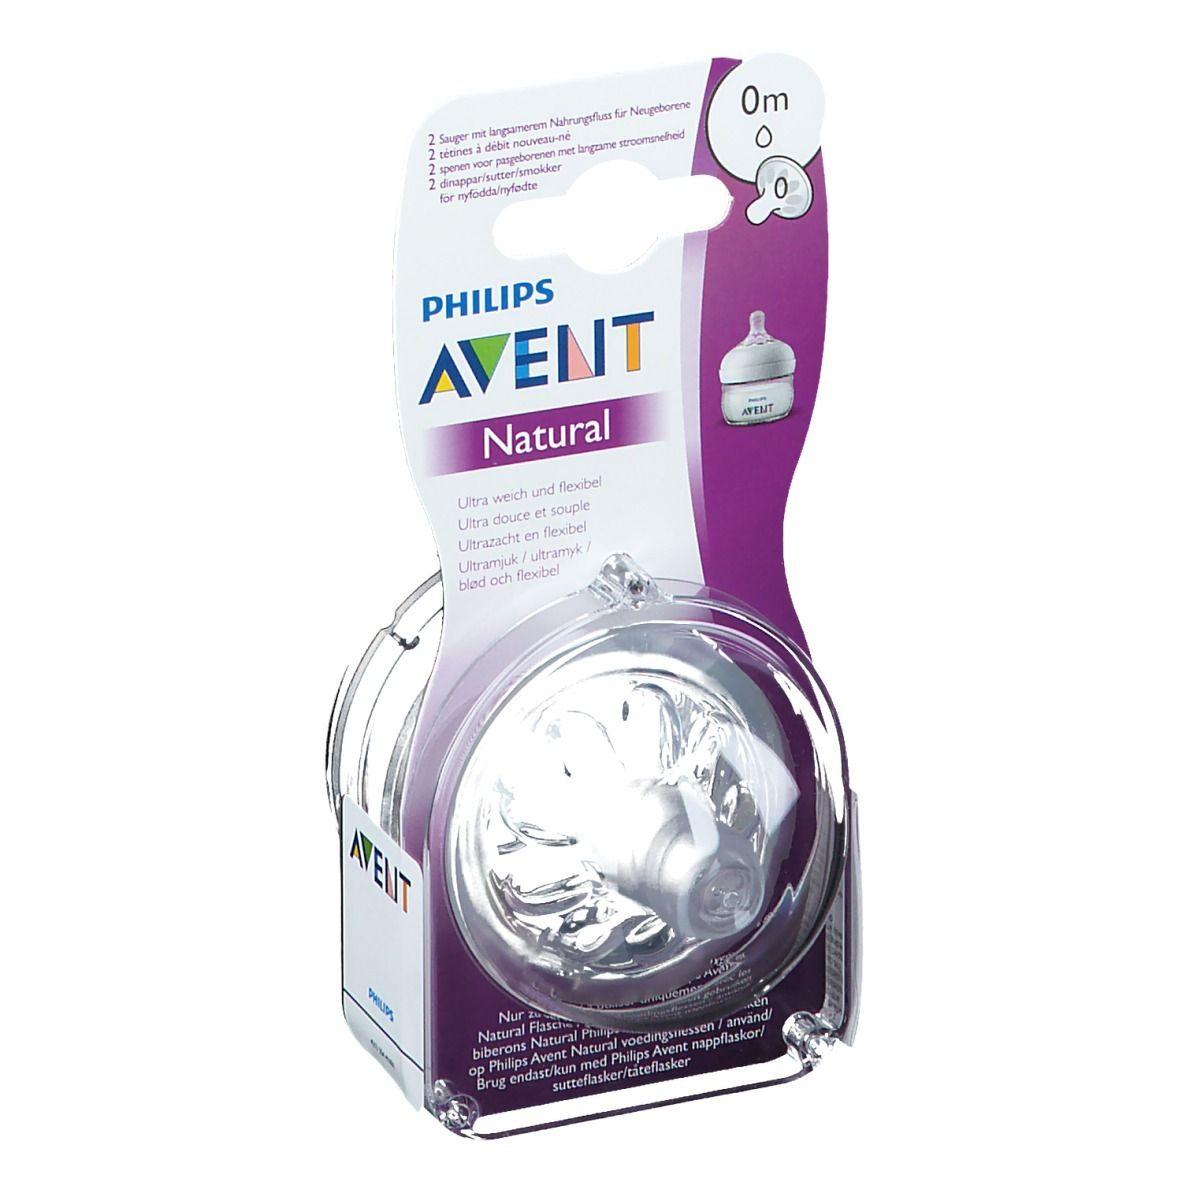 Philips AVENT Tétine Natural 0m+